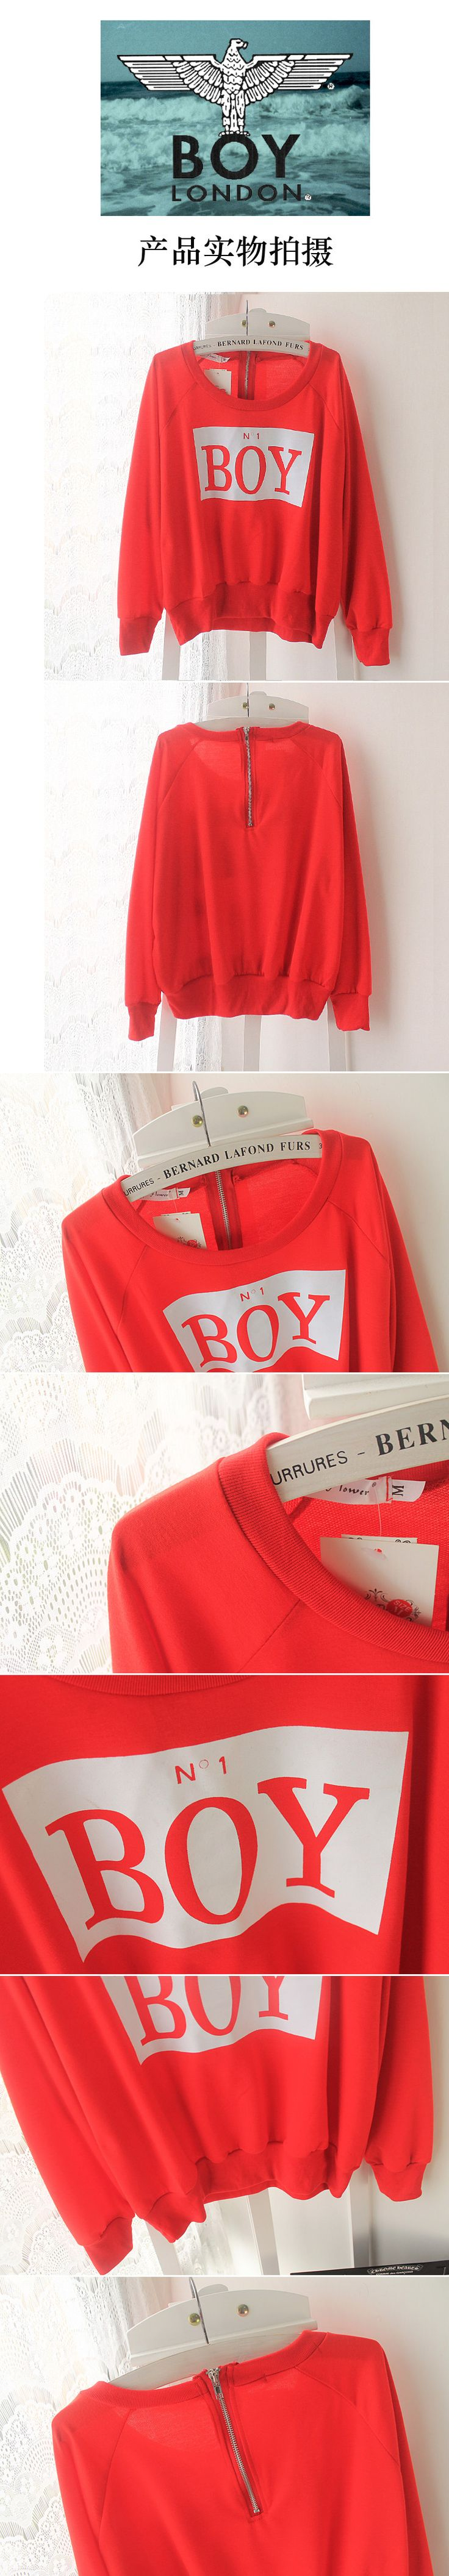 Street HARAJUKU letter red zipper gold batwing sleeve sweatshirt loose short sleeve T shirt female shirt-inHoodies & Sweatshirts from Women's Clothing & Accessories on Aliexpress.com | Alibaba Group